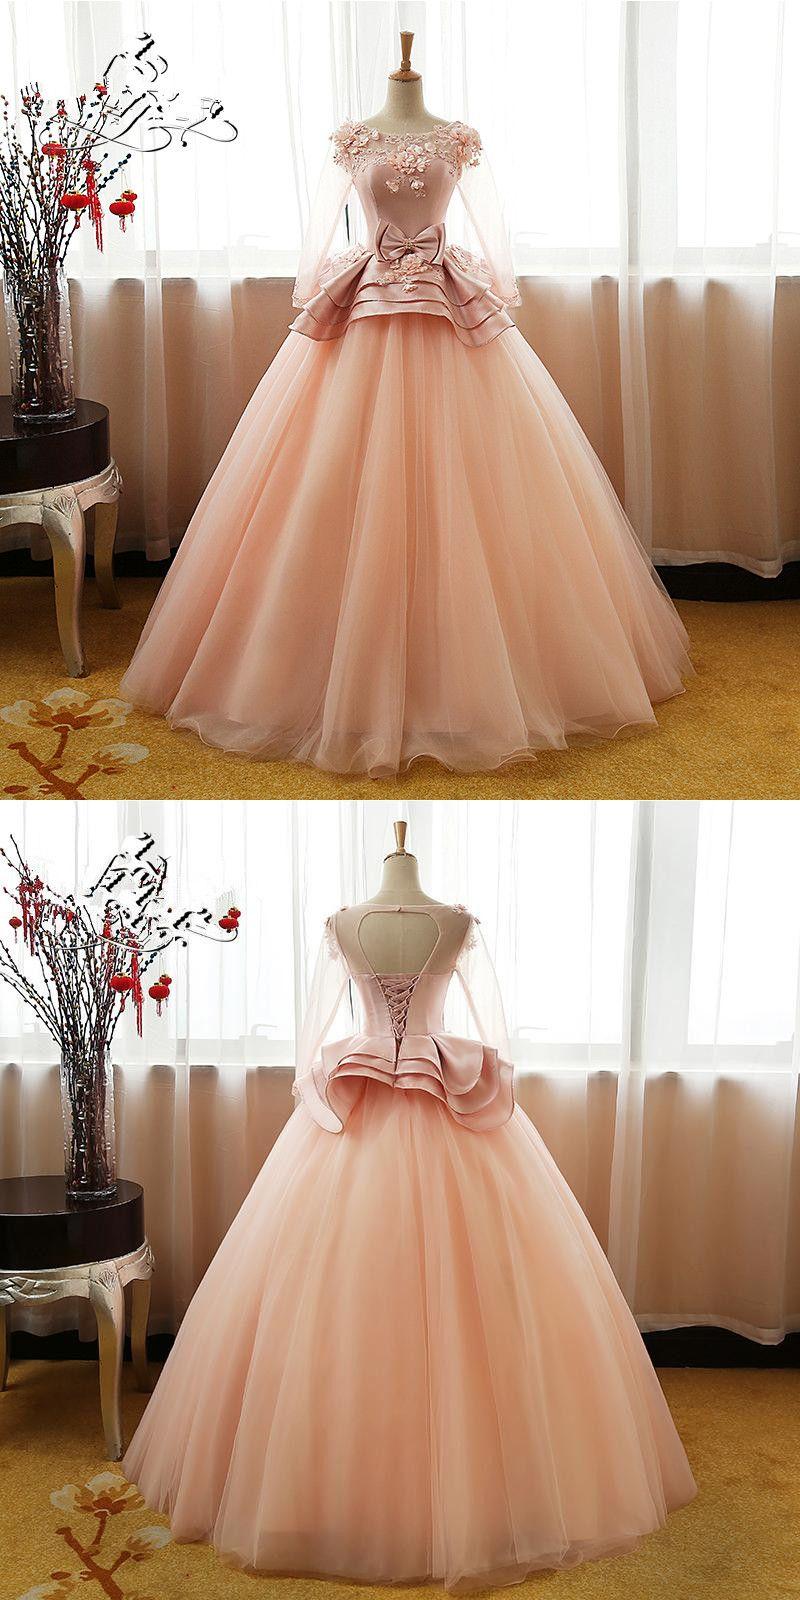 Customized delightful long sleeves prom dresses vintage flower long